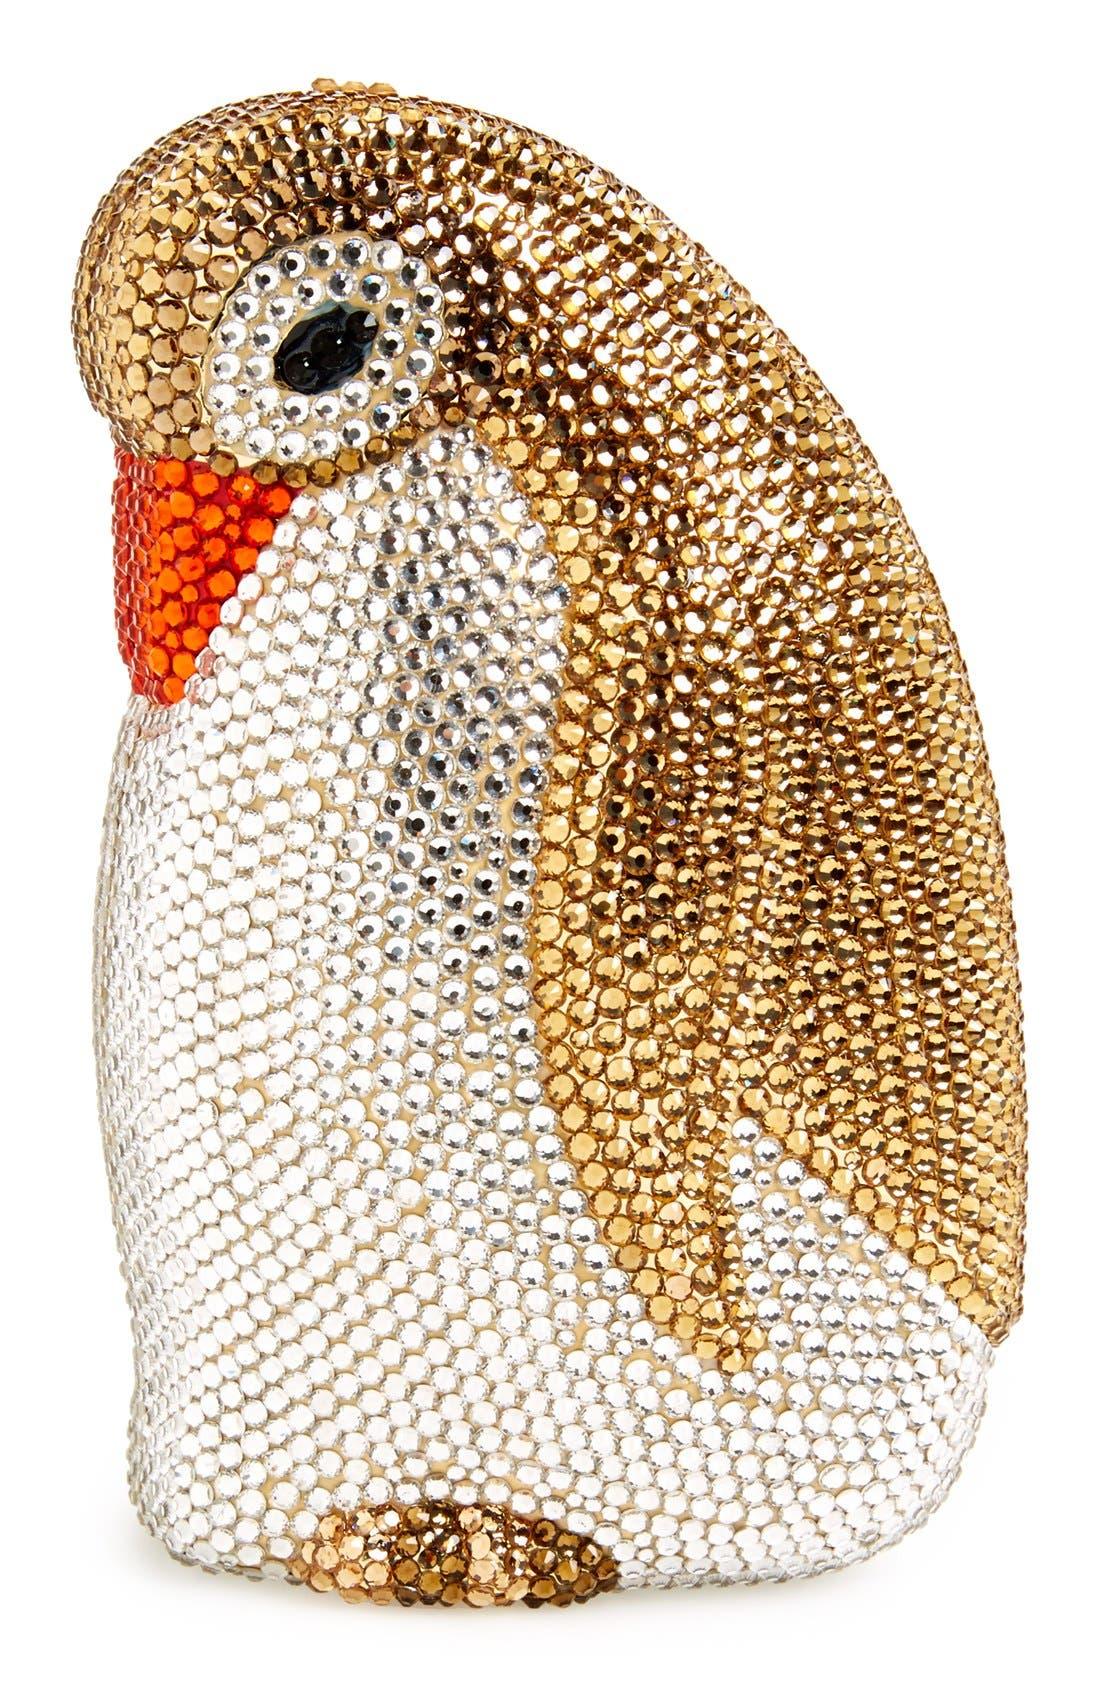 Main Image - Natasha Couture 'Penny The Penguin' Crystal Clutch